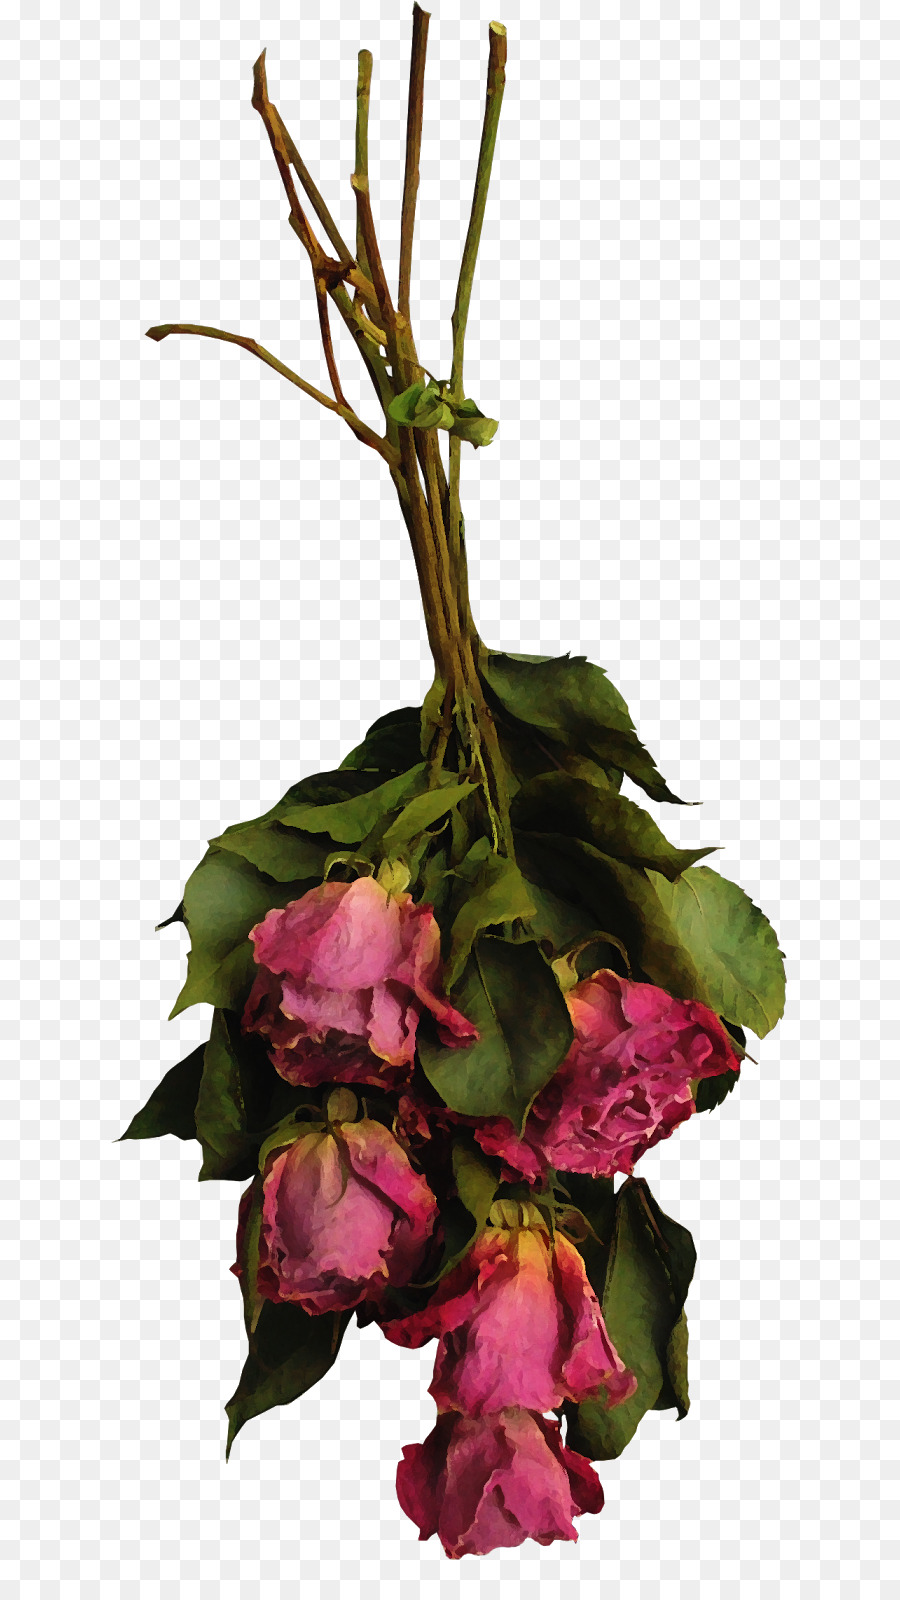 Floral design Cut flowers Rose Flower bouquet - dried flowers png ...